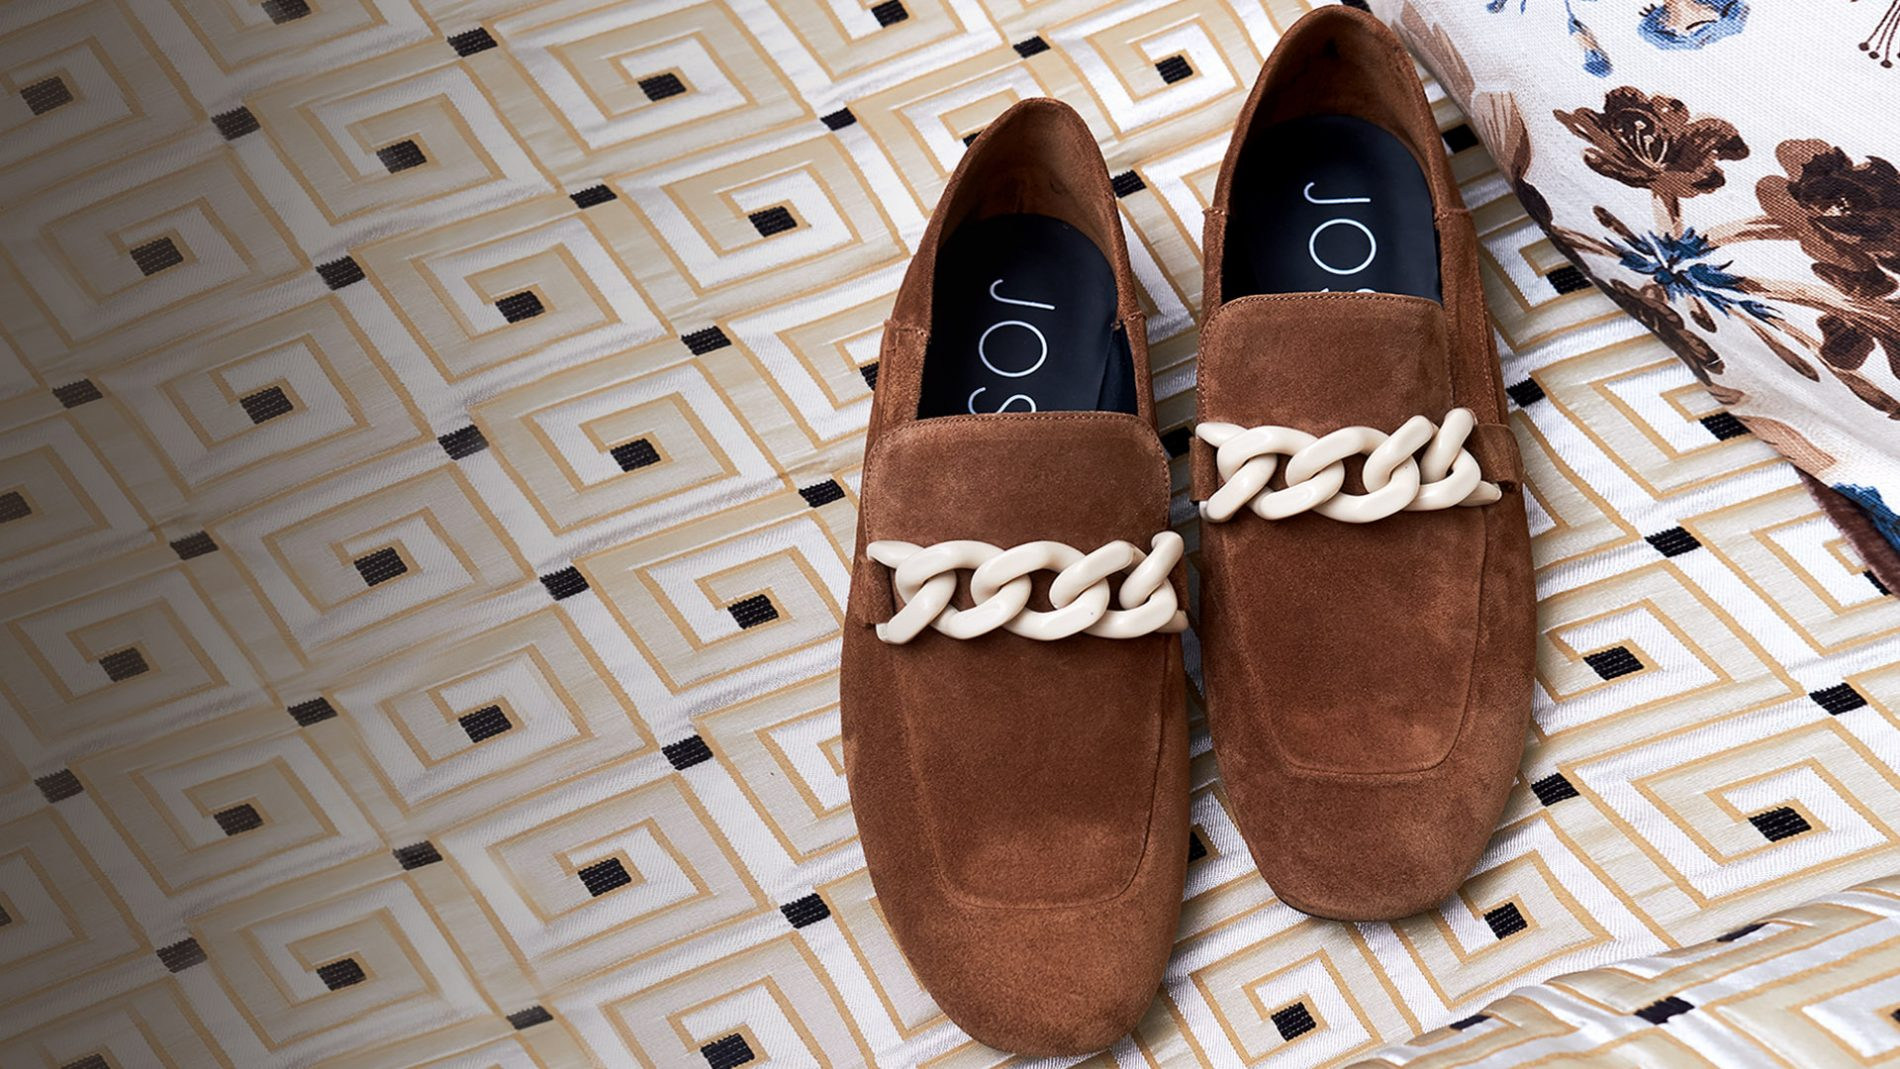 El Corte Inglés El Corte Inglés Designer Shoes Joseph Loaffers